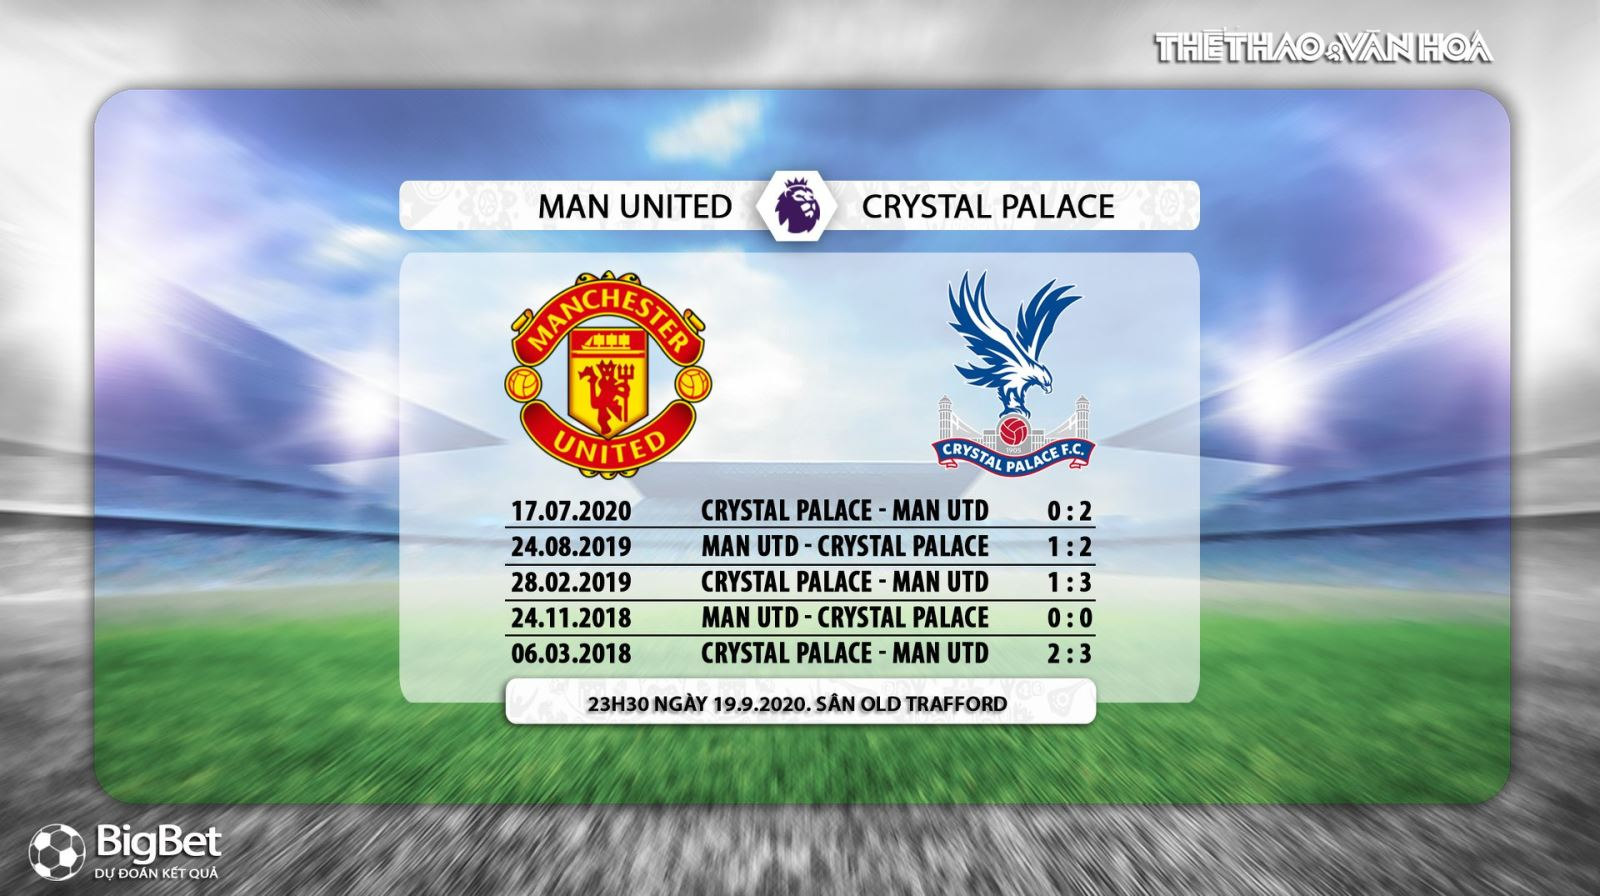 MUvs Crystal Palace, MU, Crystal Palace, trực tiếp bóng đá, bóng đá, bóng đá hôm nay, soi kèo, kèo bóng đá, soi kèo MUvs Crystal Palace, nhận định MUvs Crystal Palace